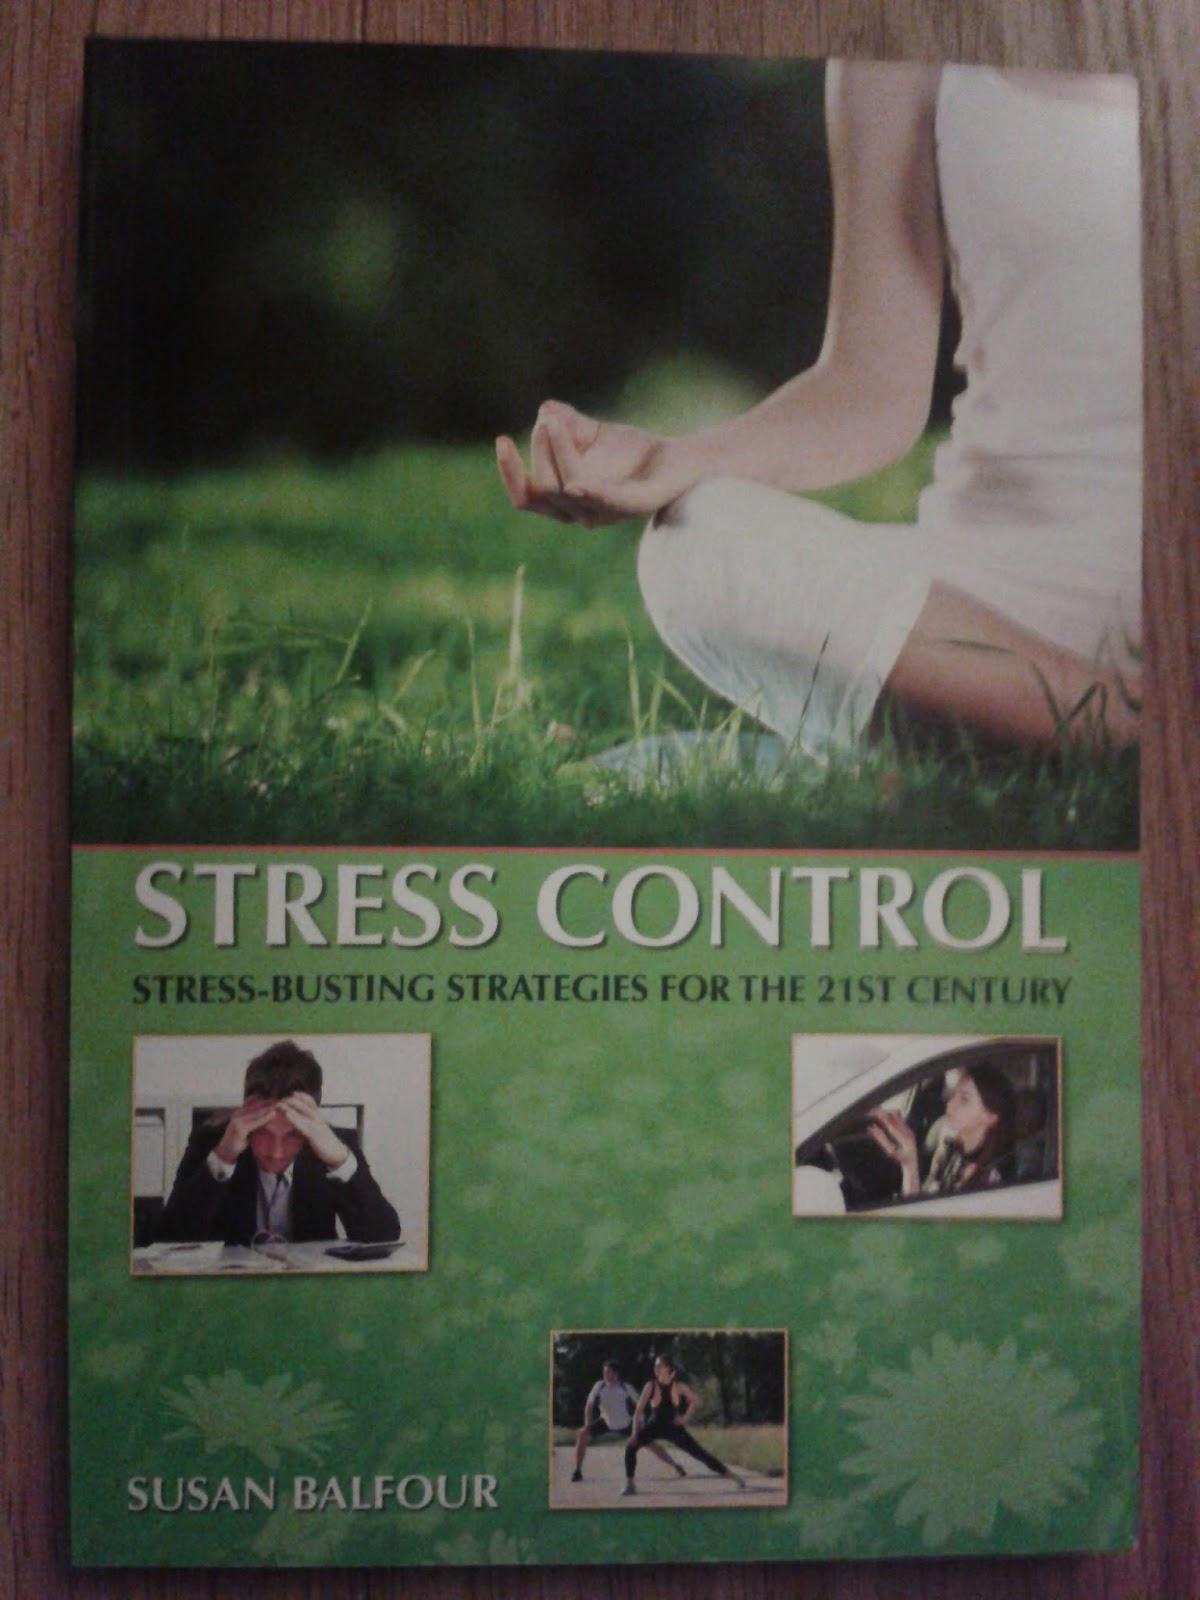 Self help stress management book - Stress Control by Susan Balfour